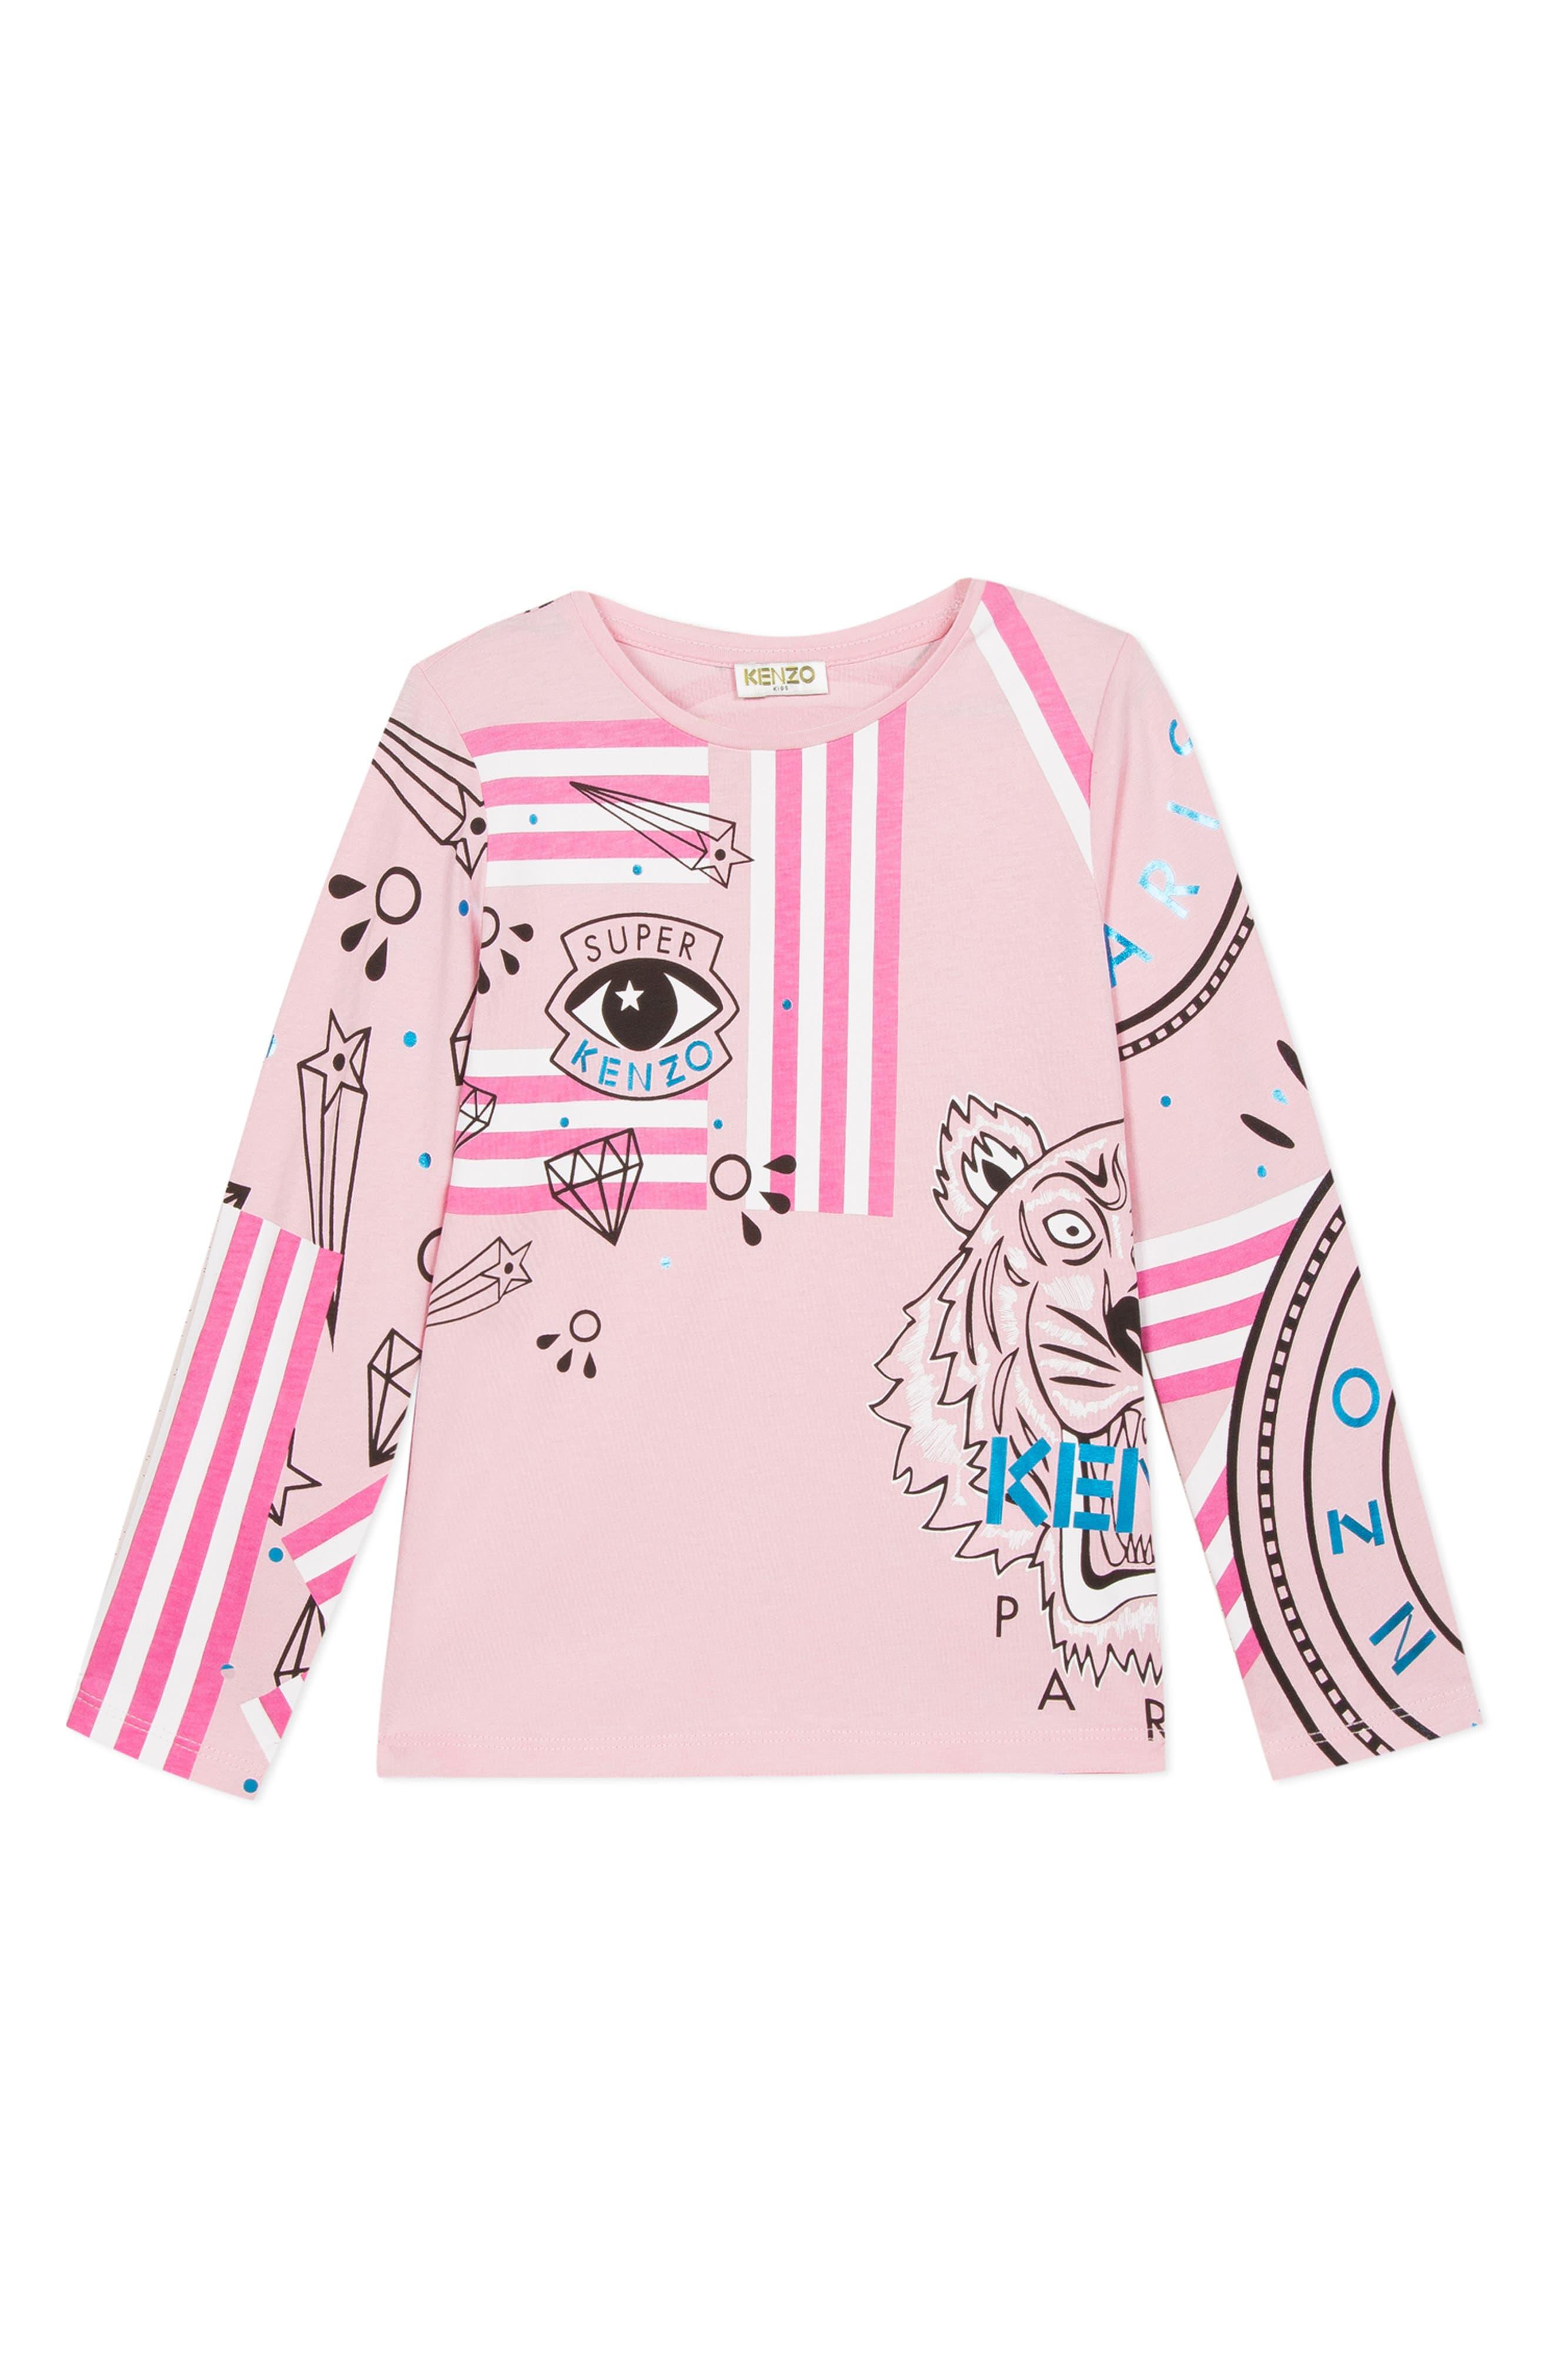 Toddler Girls Kenzo Iconic Eye Graphic Tee Size 2Y  Pink